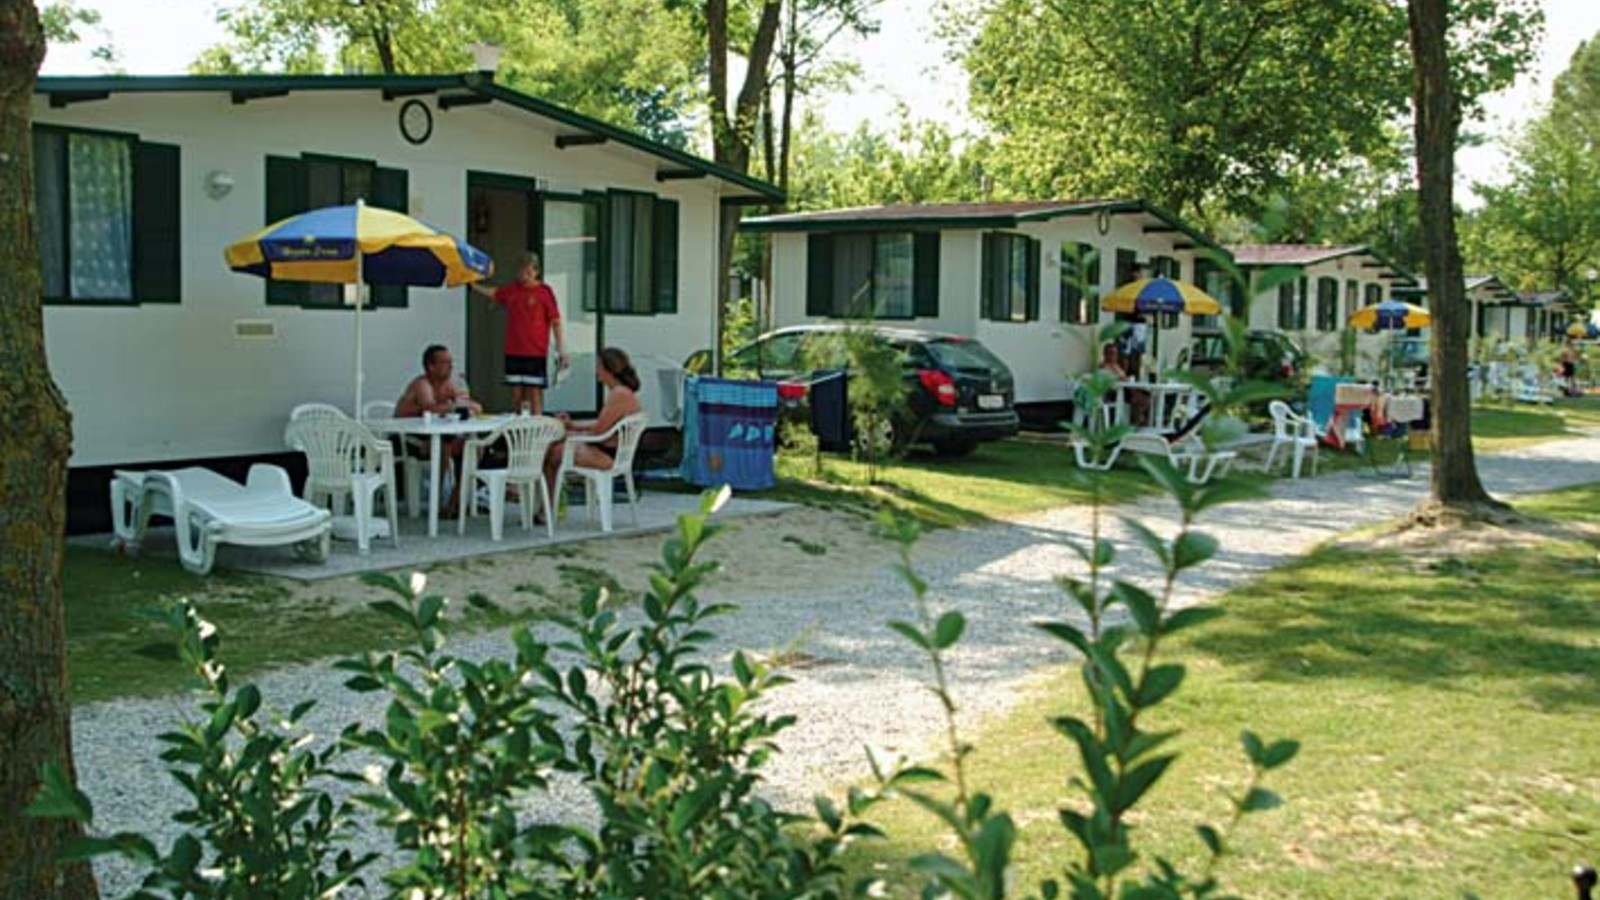 bella_italia_mobile_home_141.jpg